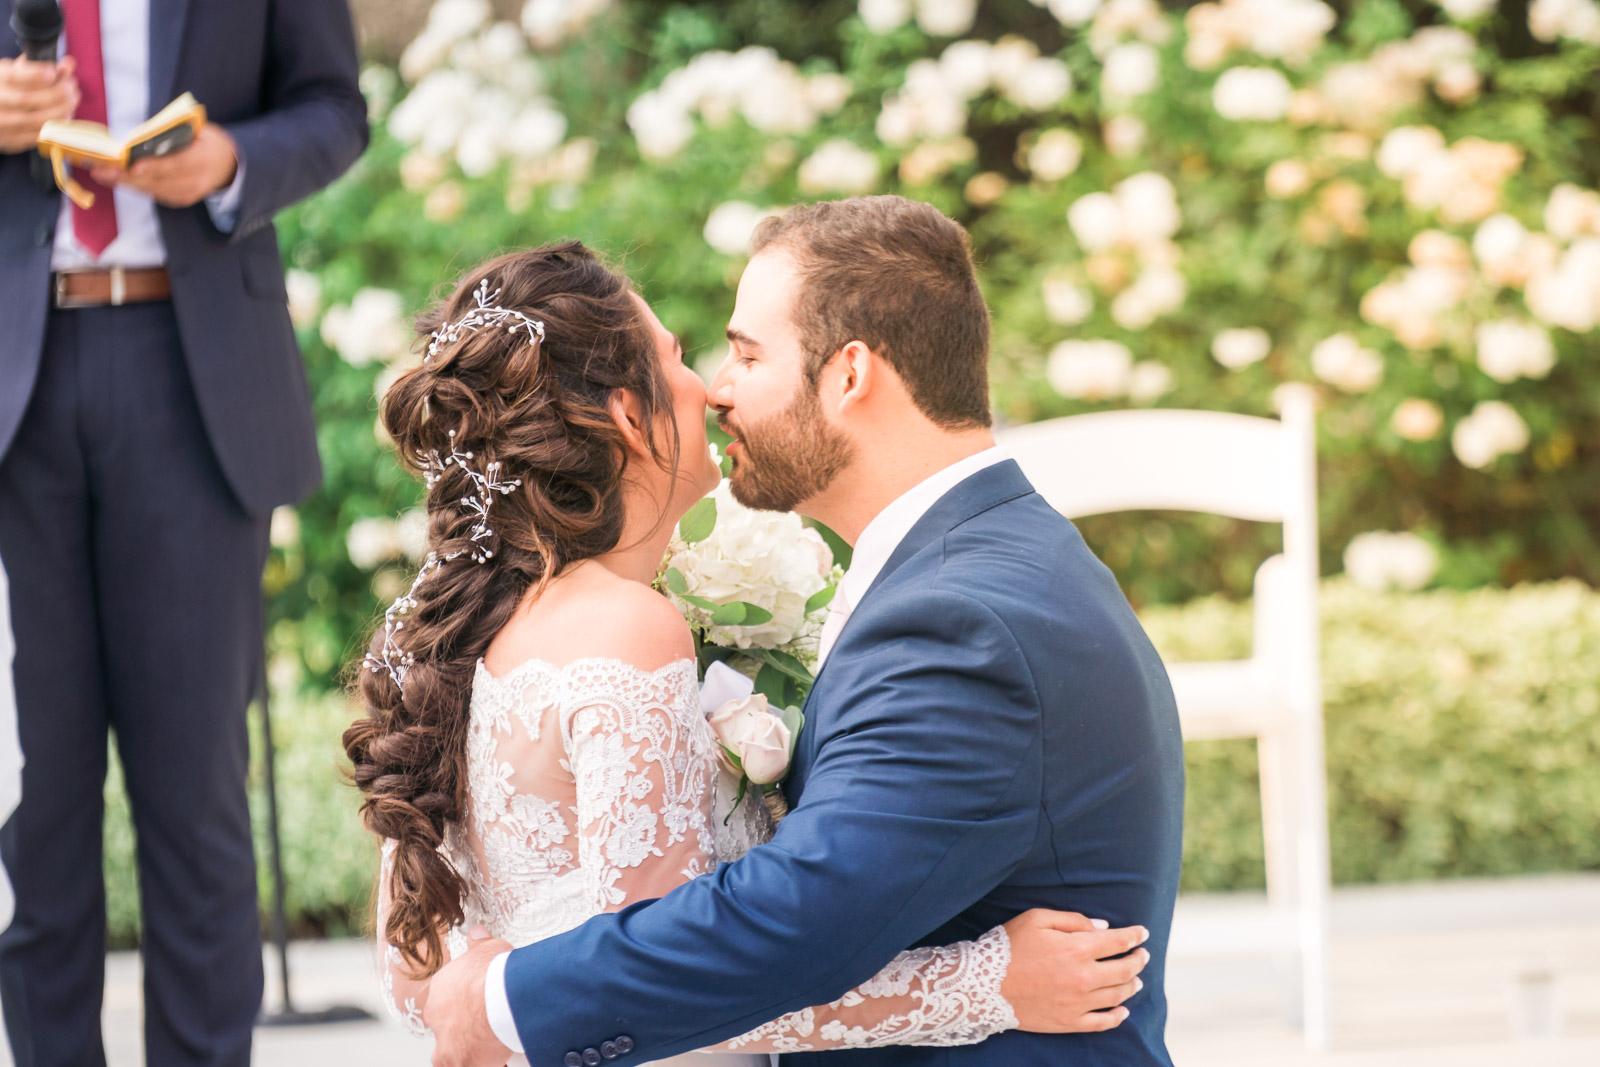 155_Angel-Brea-Orange-County_Joseph-Barber-Wedding-Photography.jpg